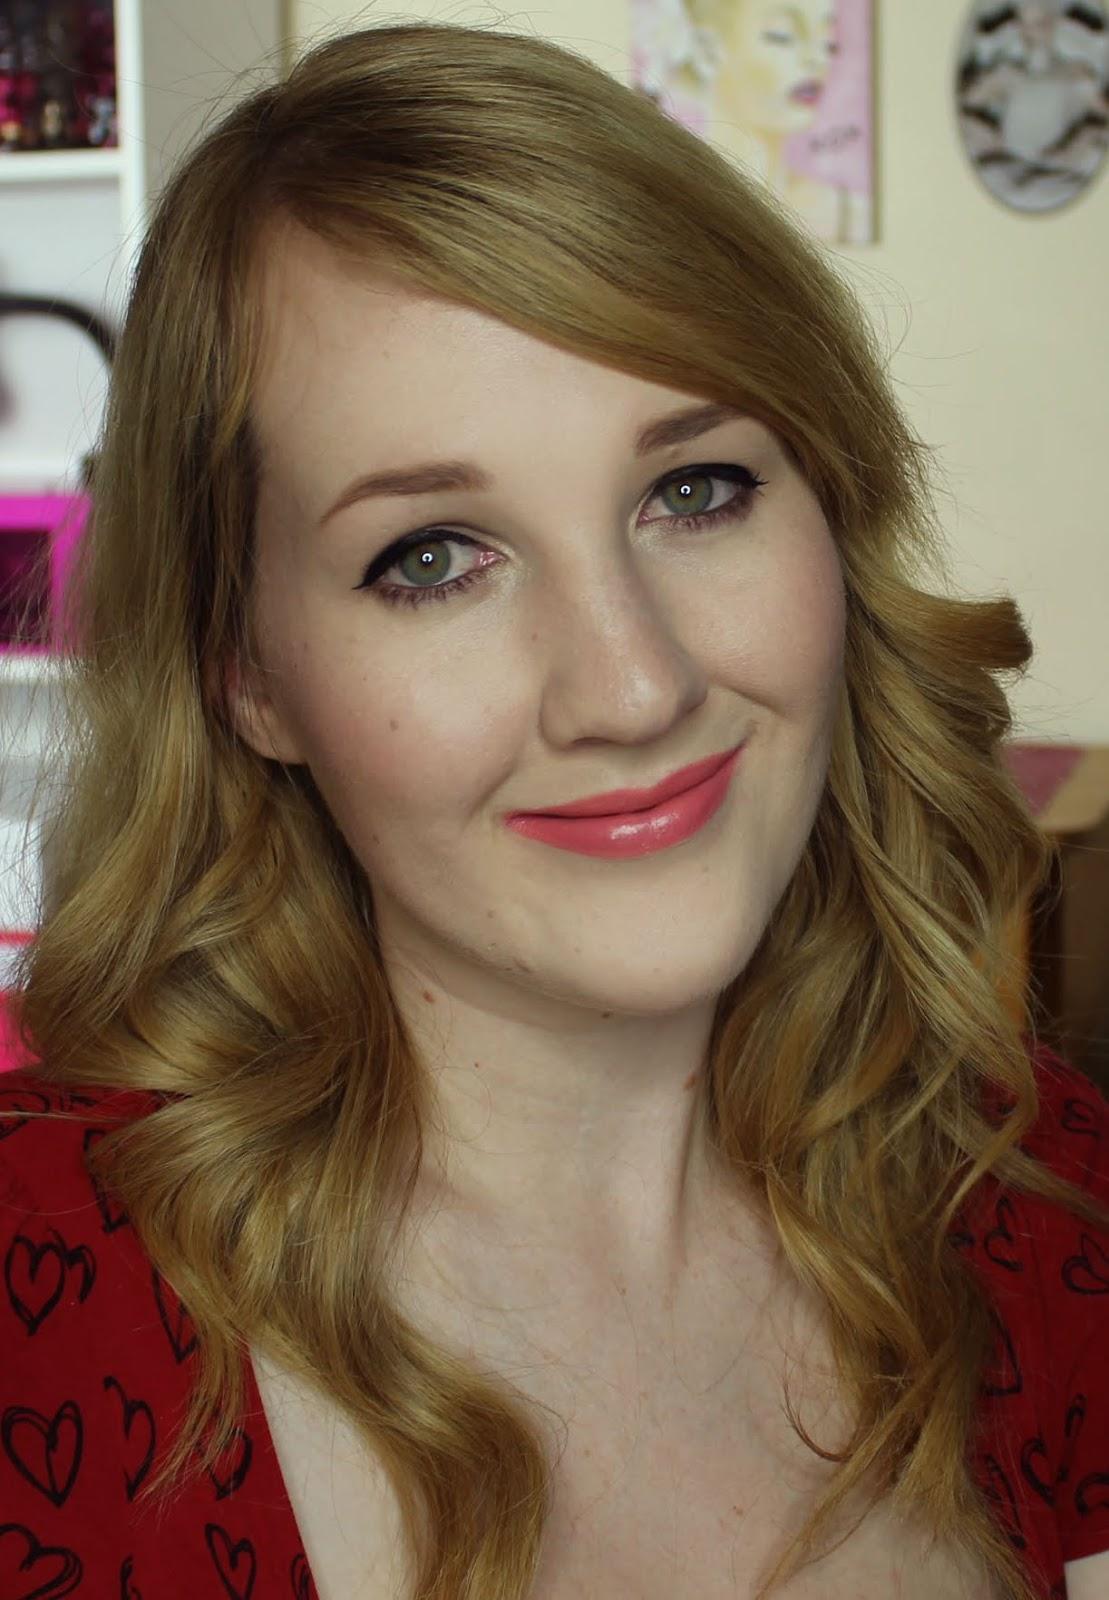 Jordana Lipsticks - Pink Lemonade Swatches & Review